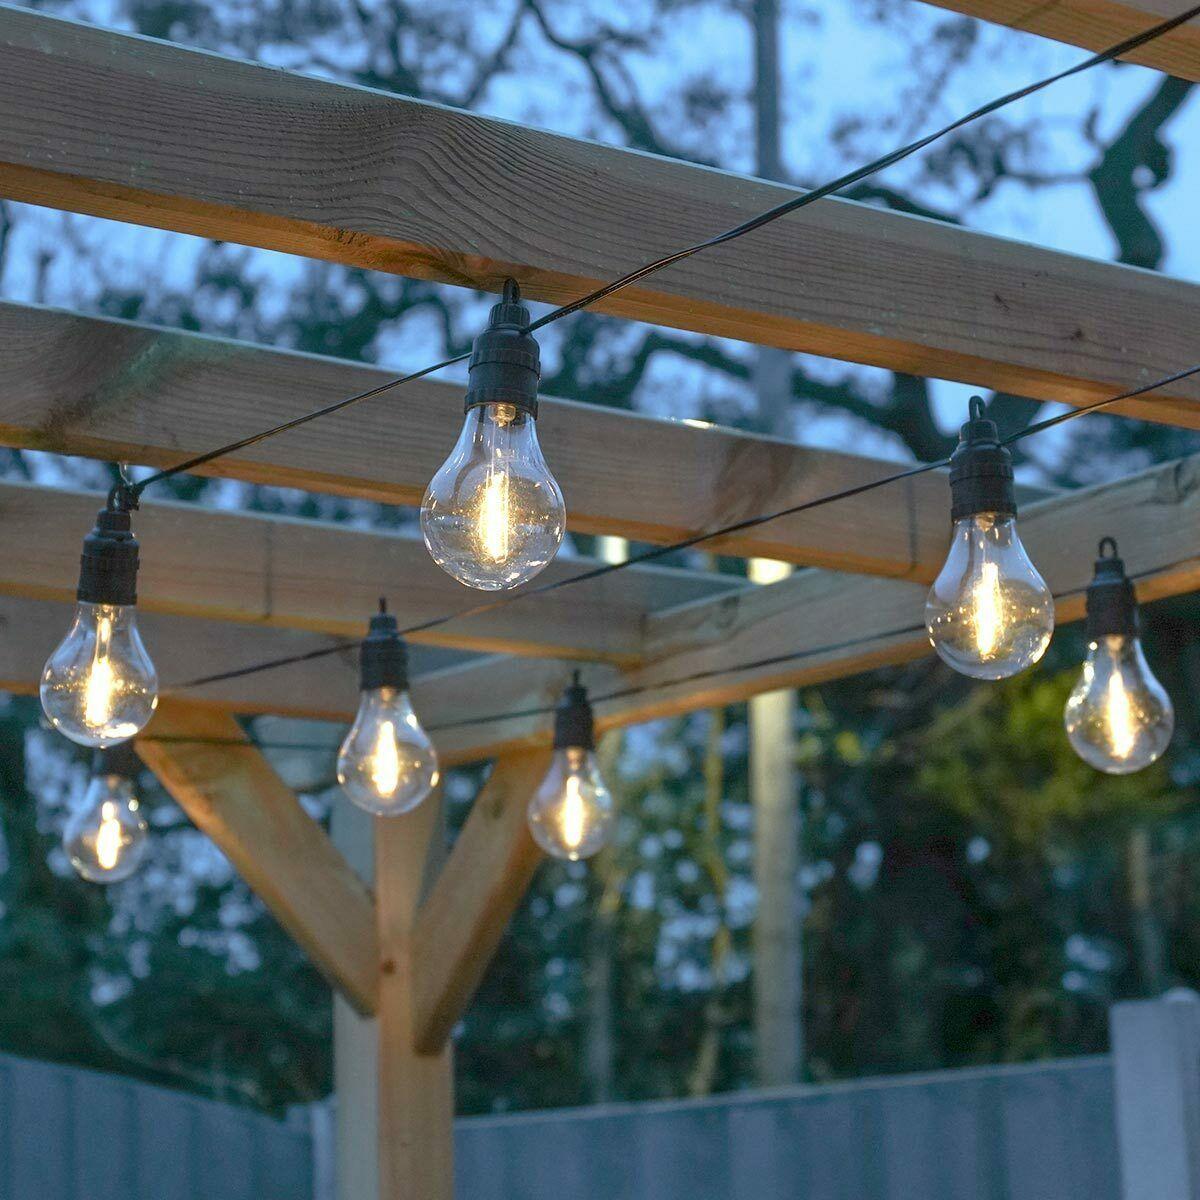 Plug In Led Filament Festoon Fairy Lights Outdoor Garden Decoration Globe Festoon Lighting Outdoor Fairy Lights Festoon Lighting Garden